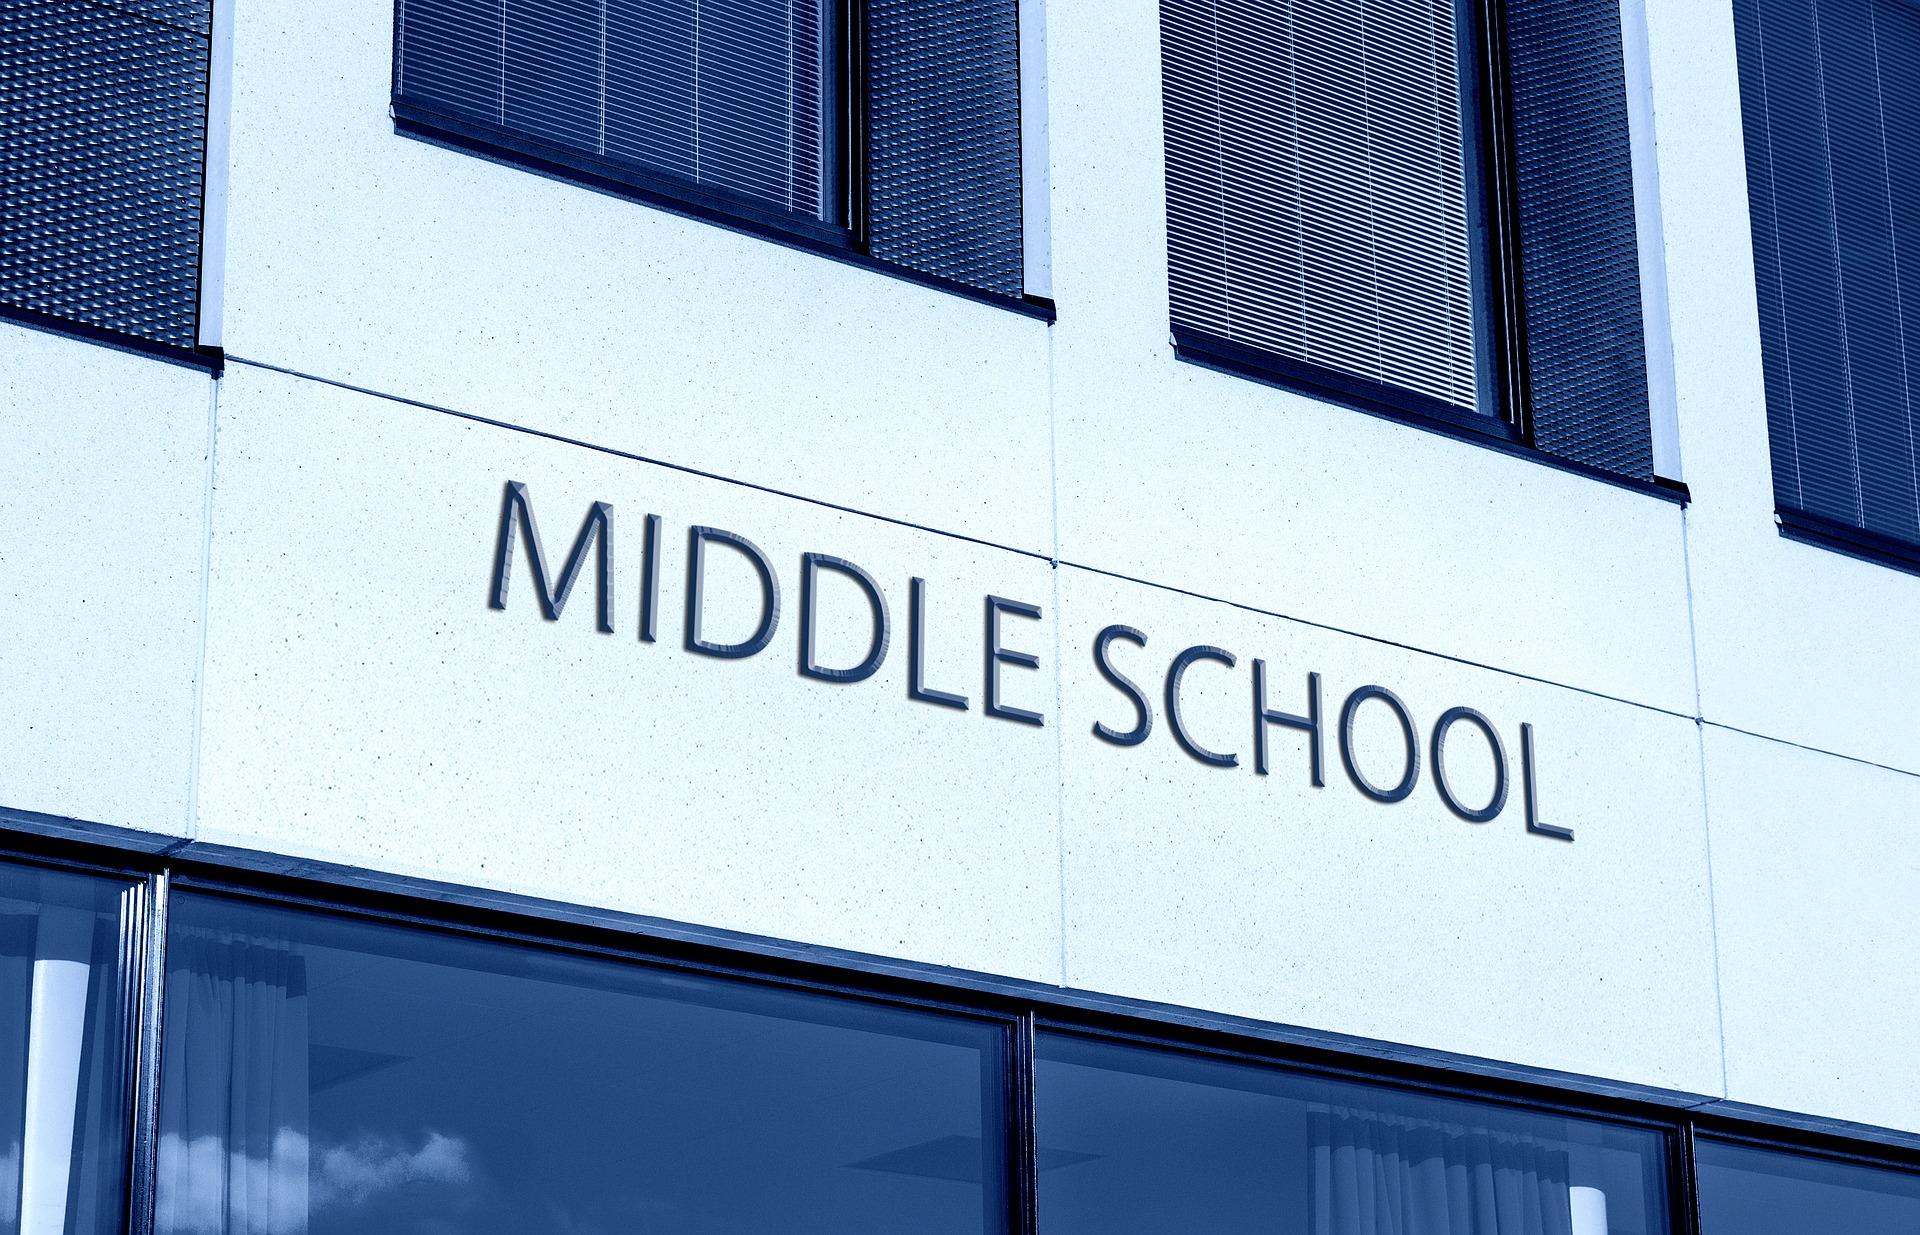 middle-school-2883660_1920.jpg